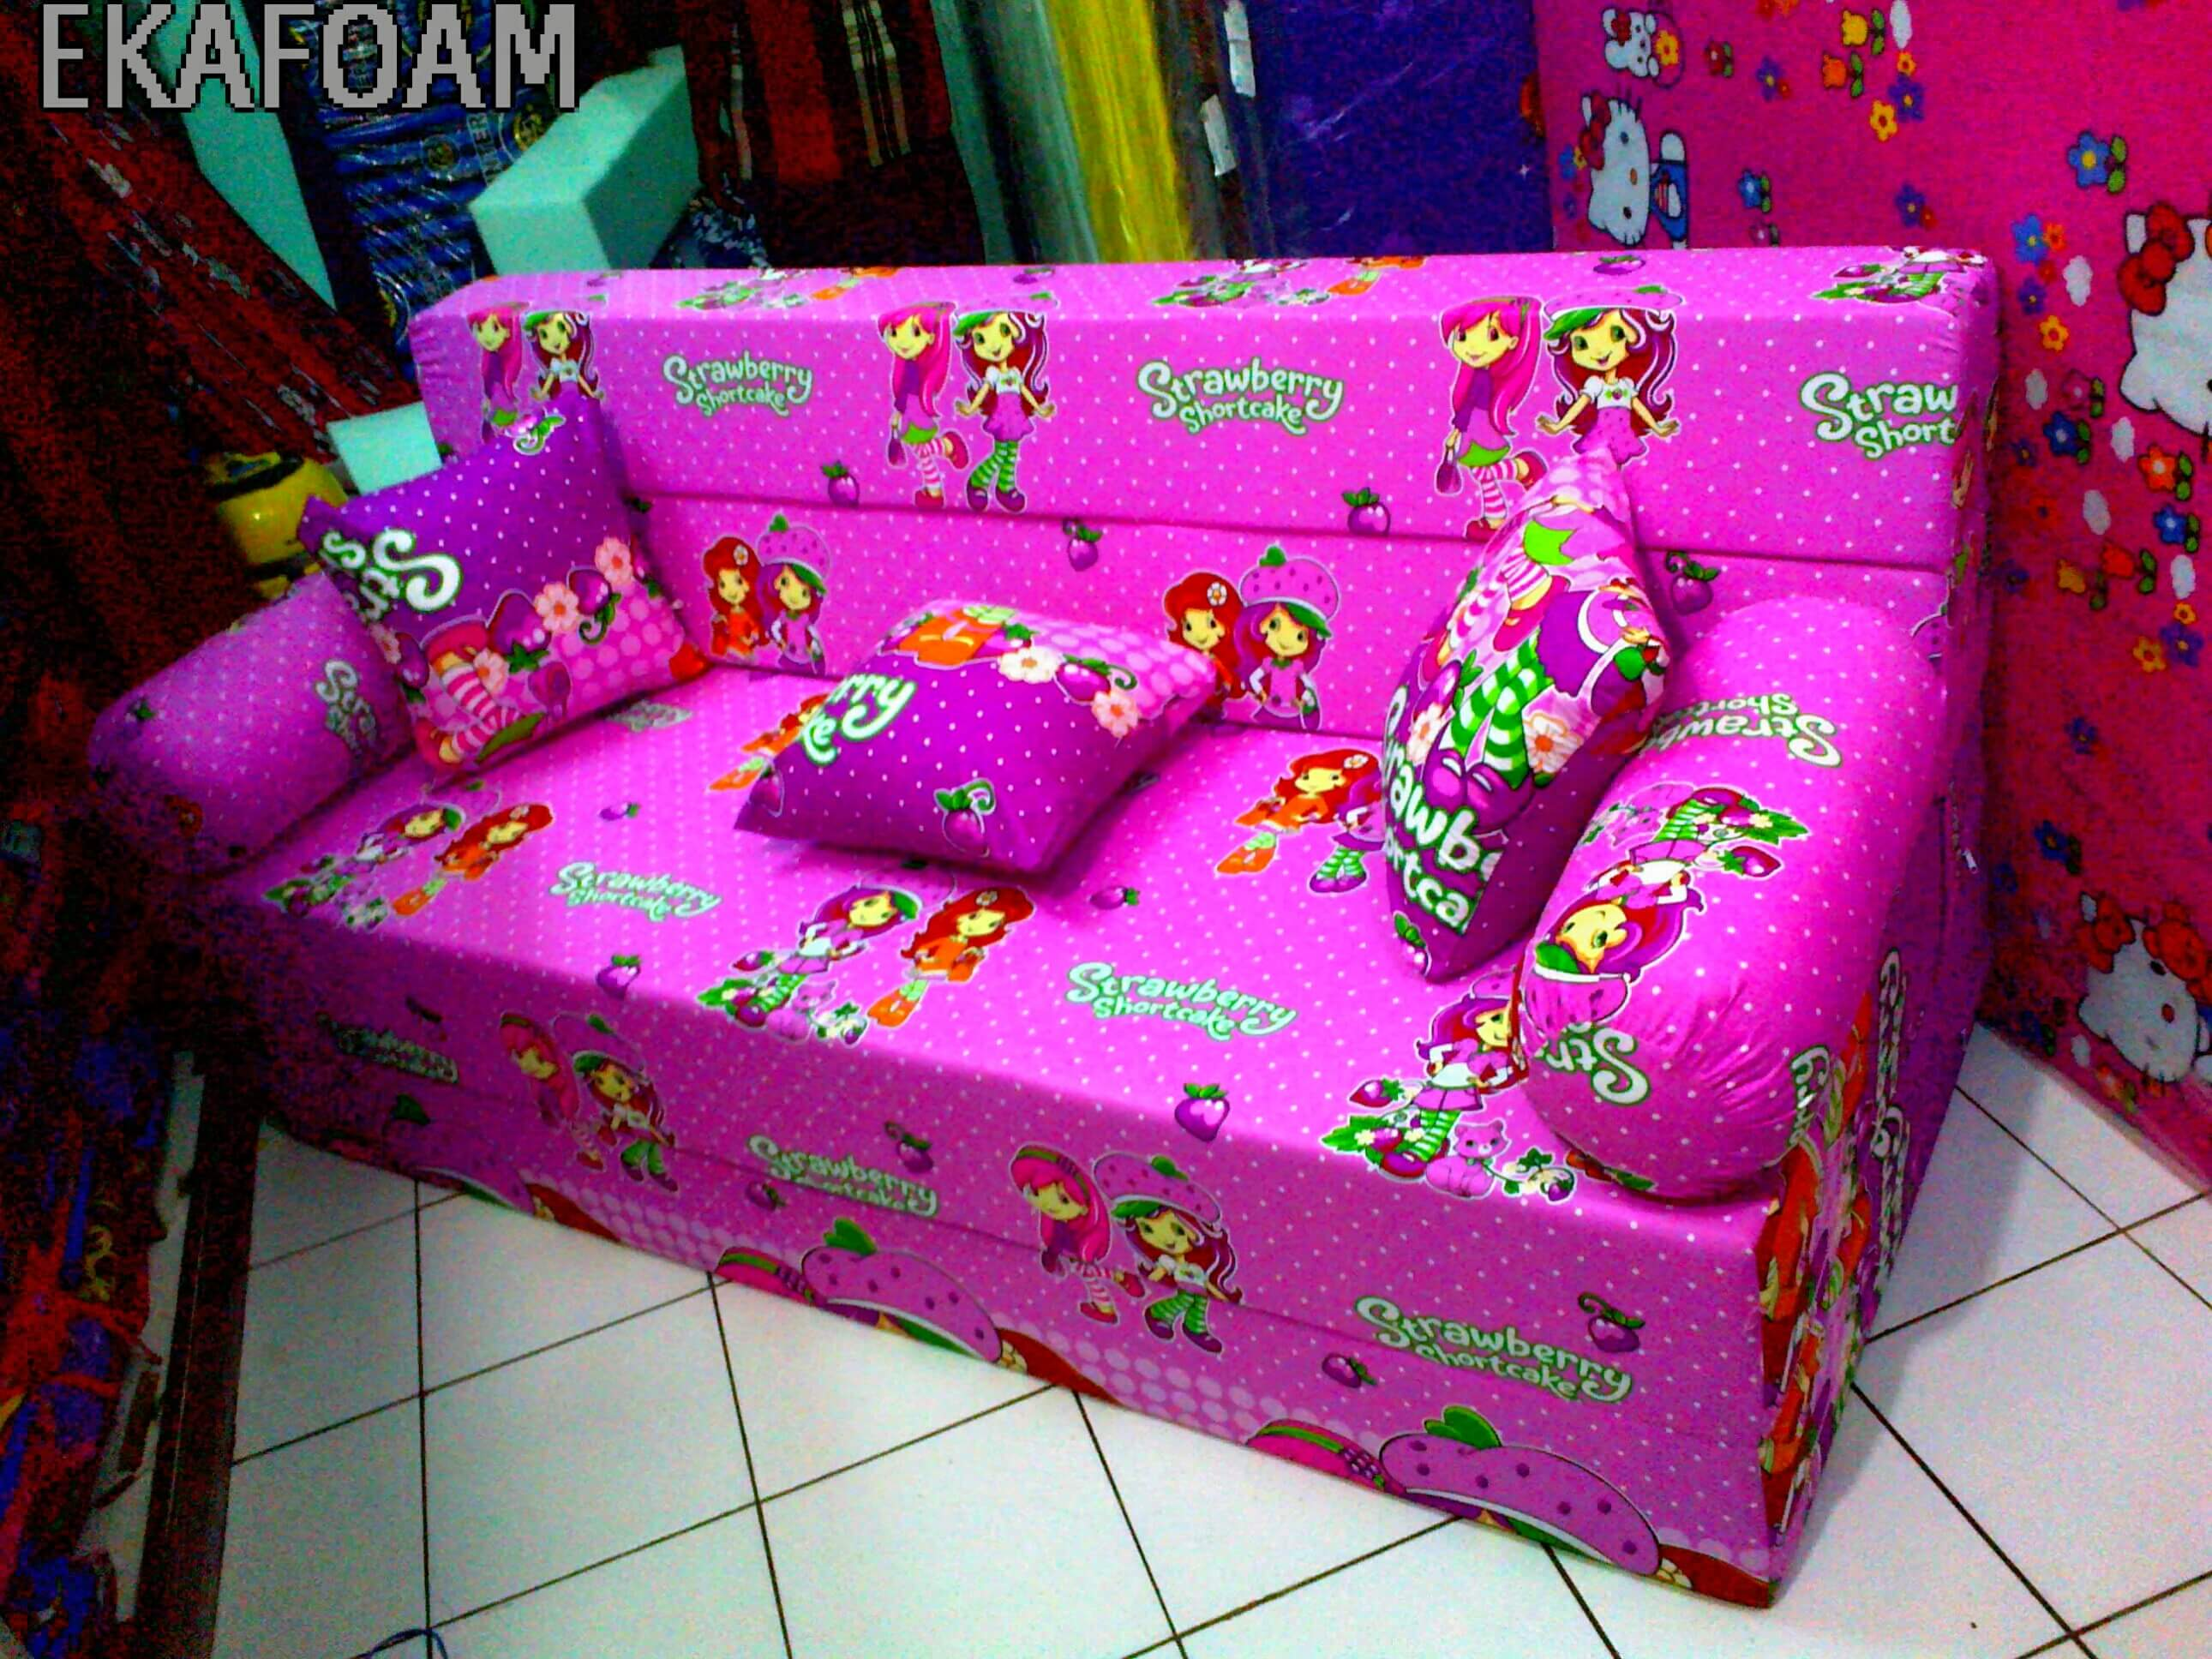 Sofa Bed Inoac Terbaru 2016 Ekafoaminoacs Blog